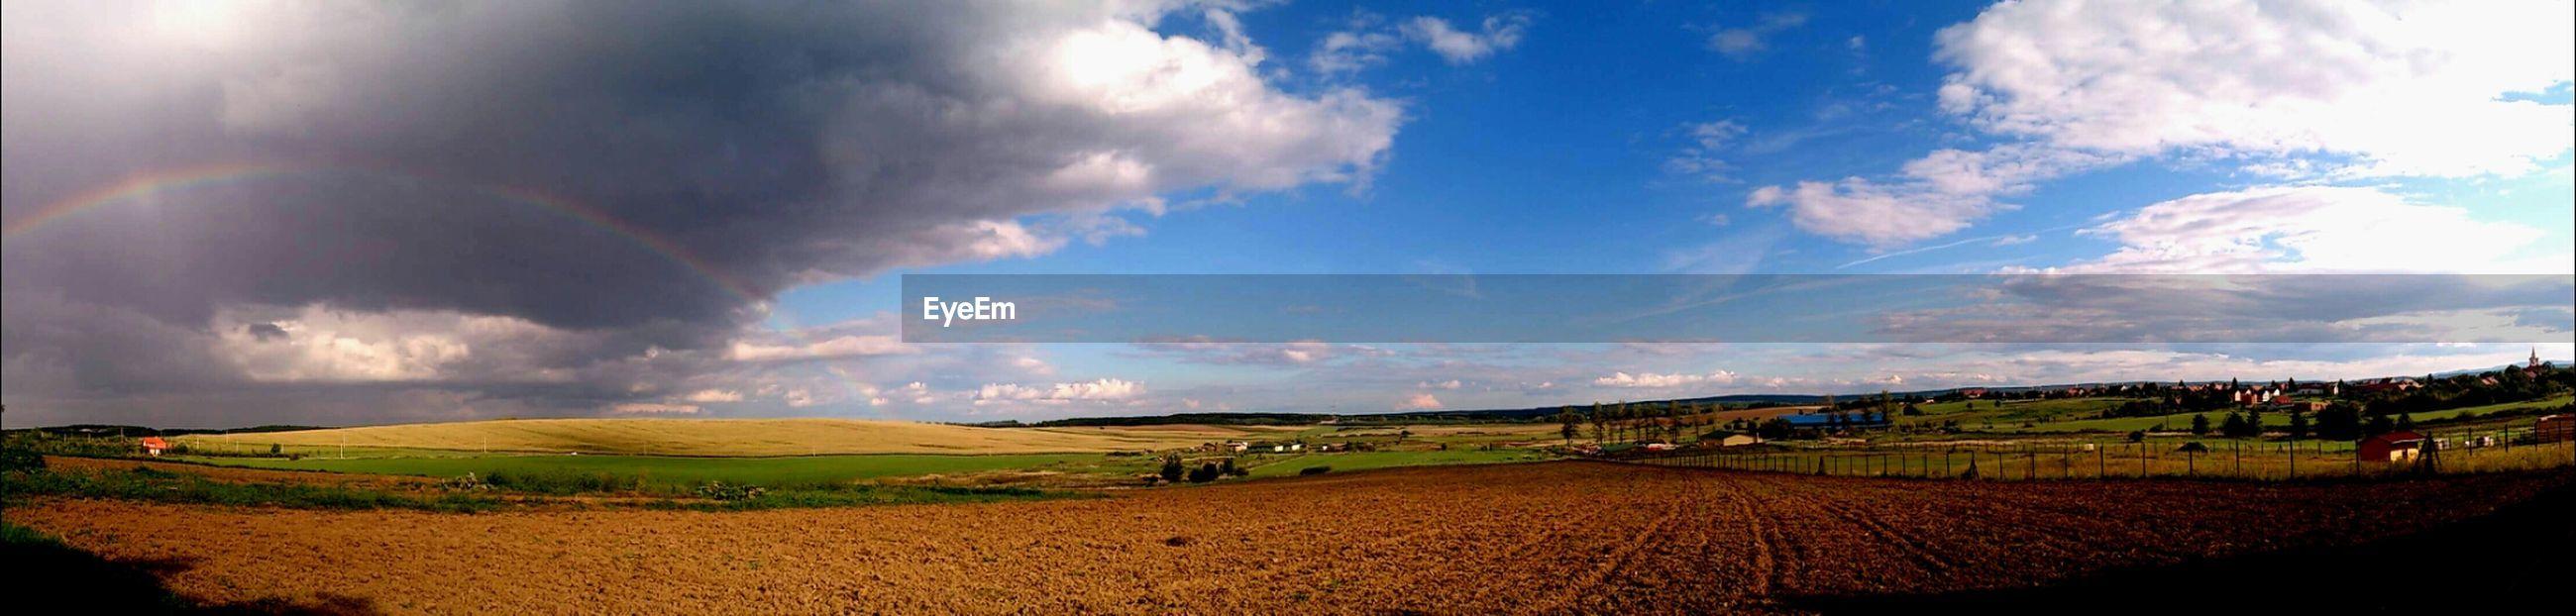 Panoramic view of plowed field